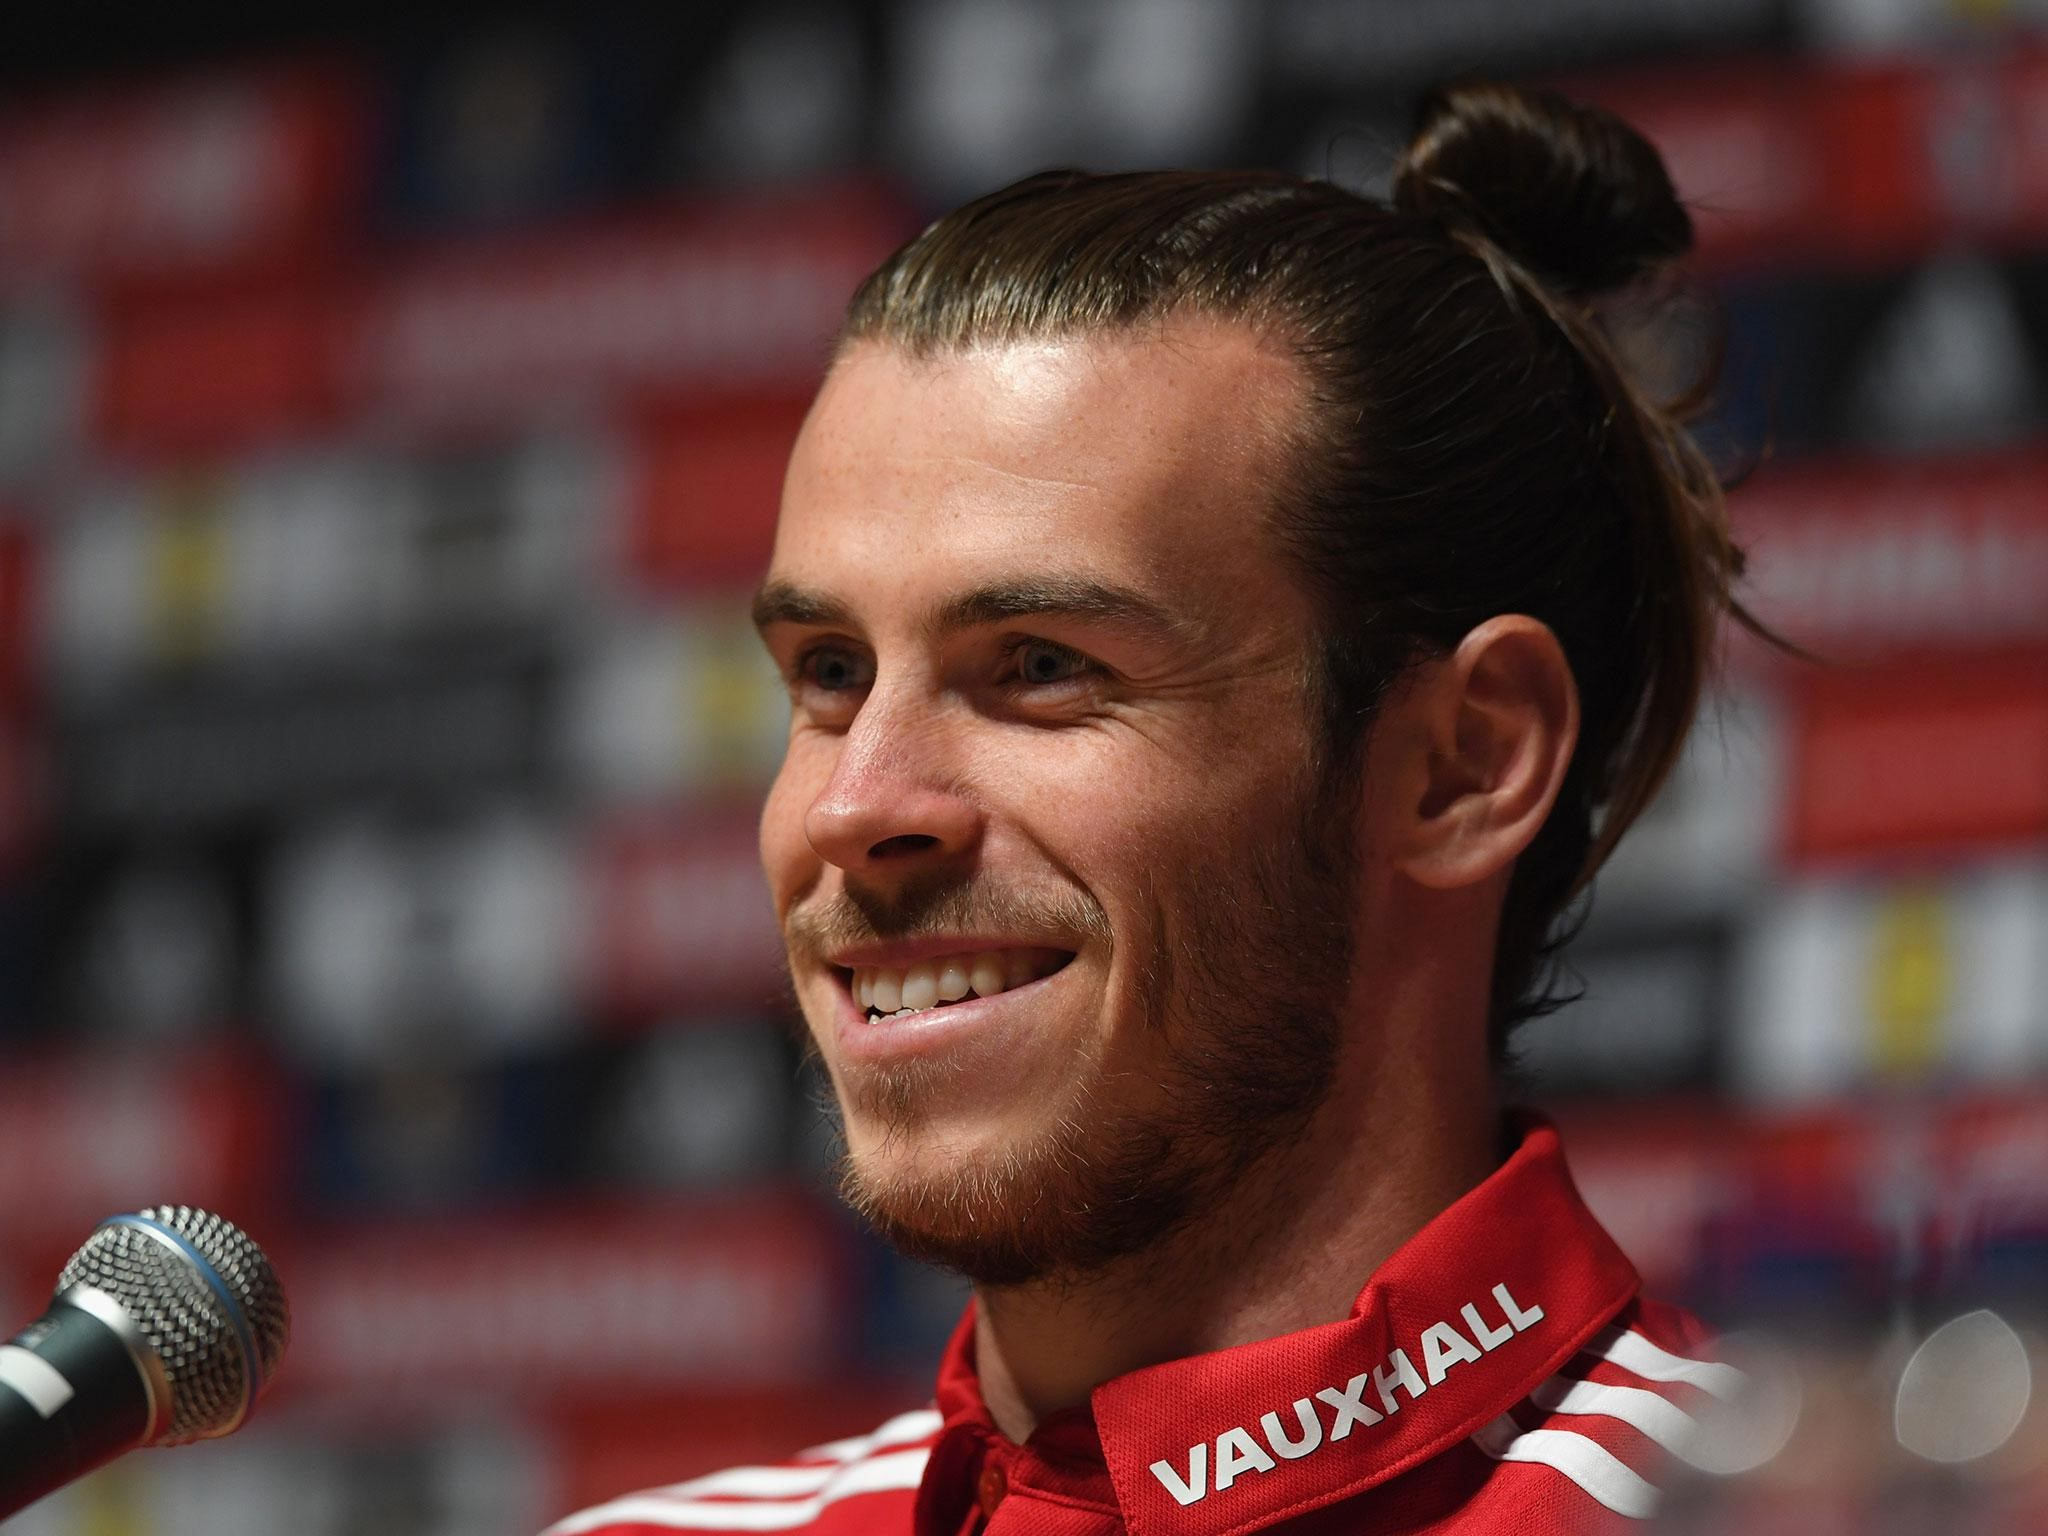 Gareth Bale Wallpapers